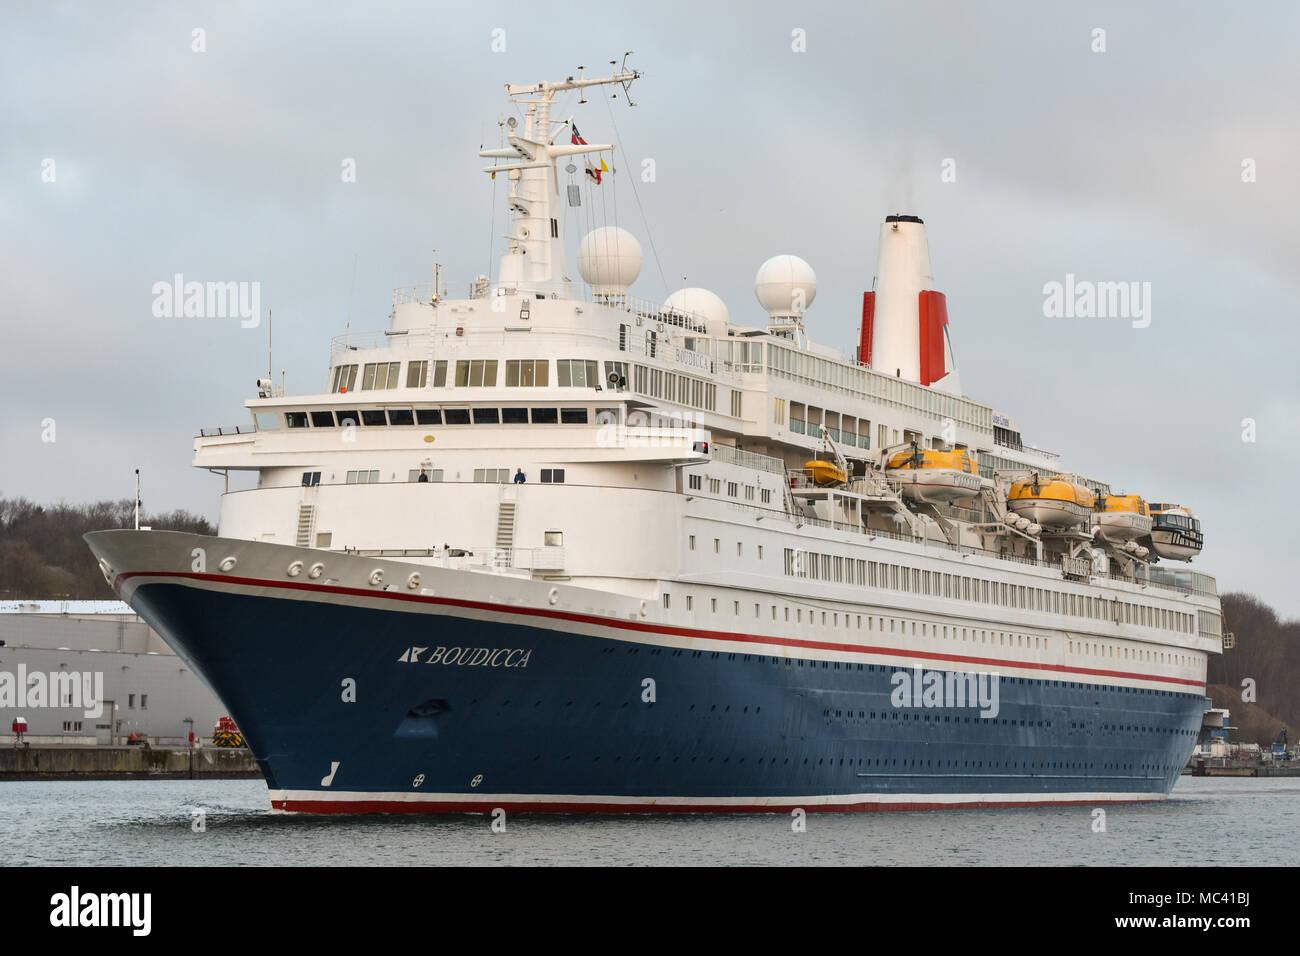 Classic cruiseship Boudicca passing the Kiel Canal bound for Kiel - Stock Image